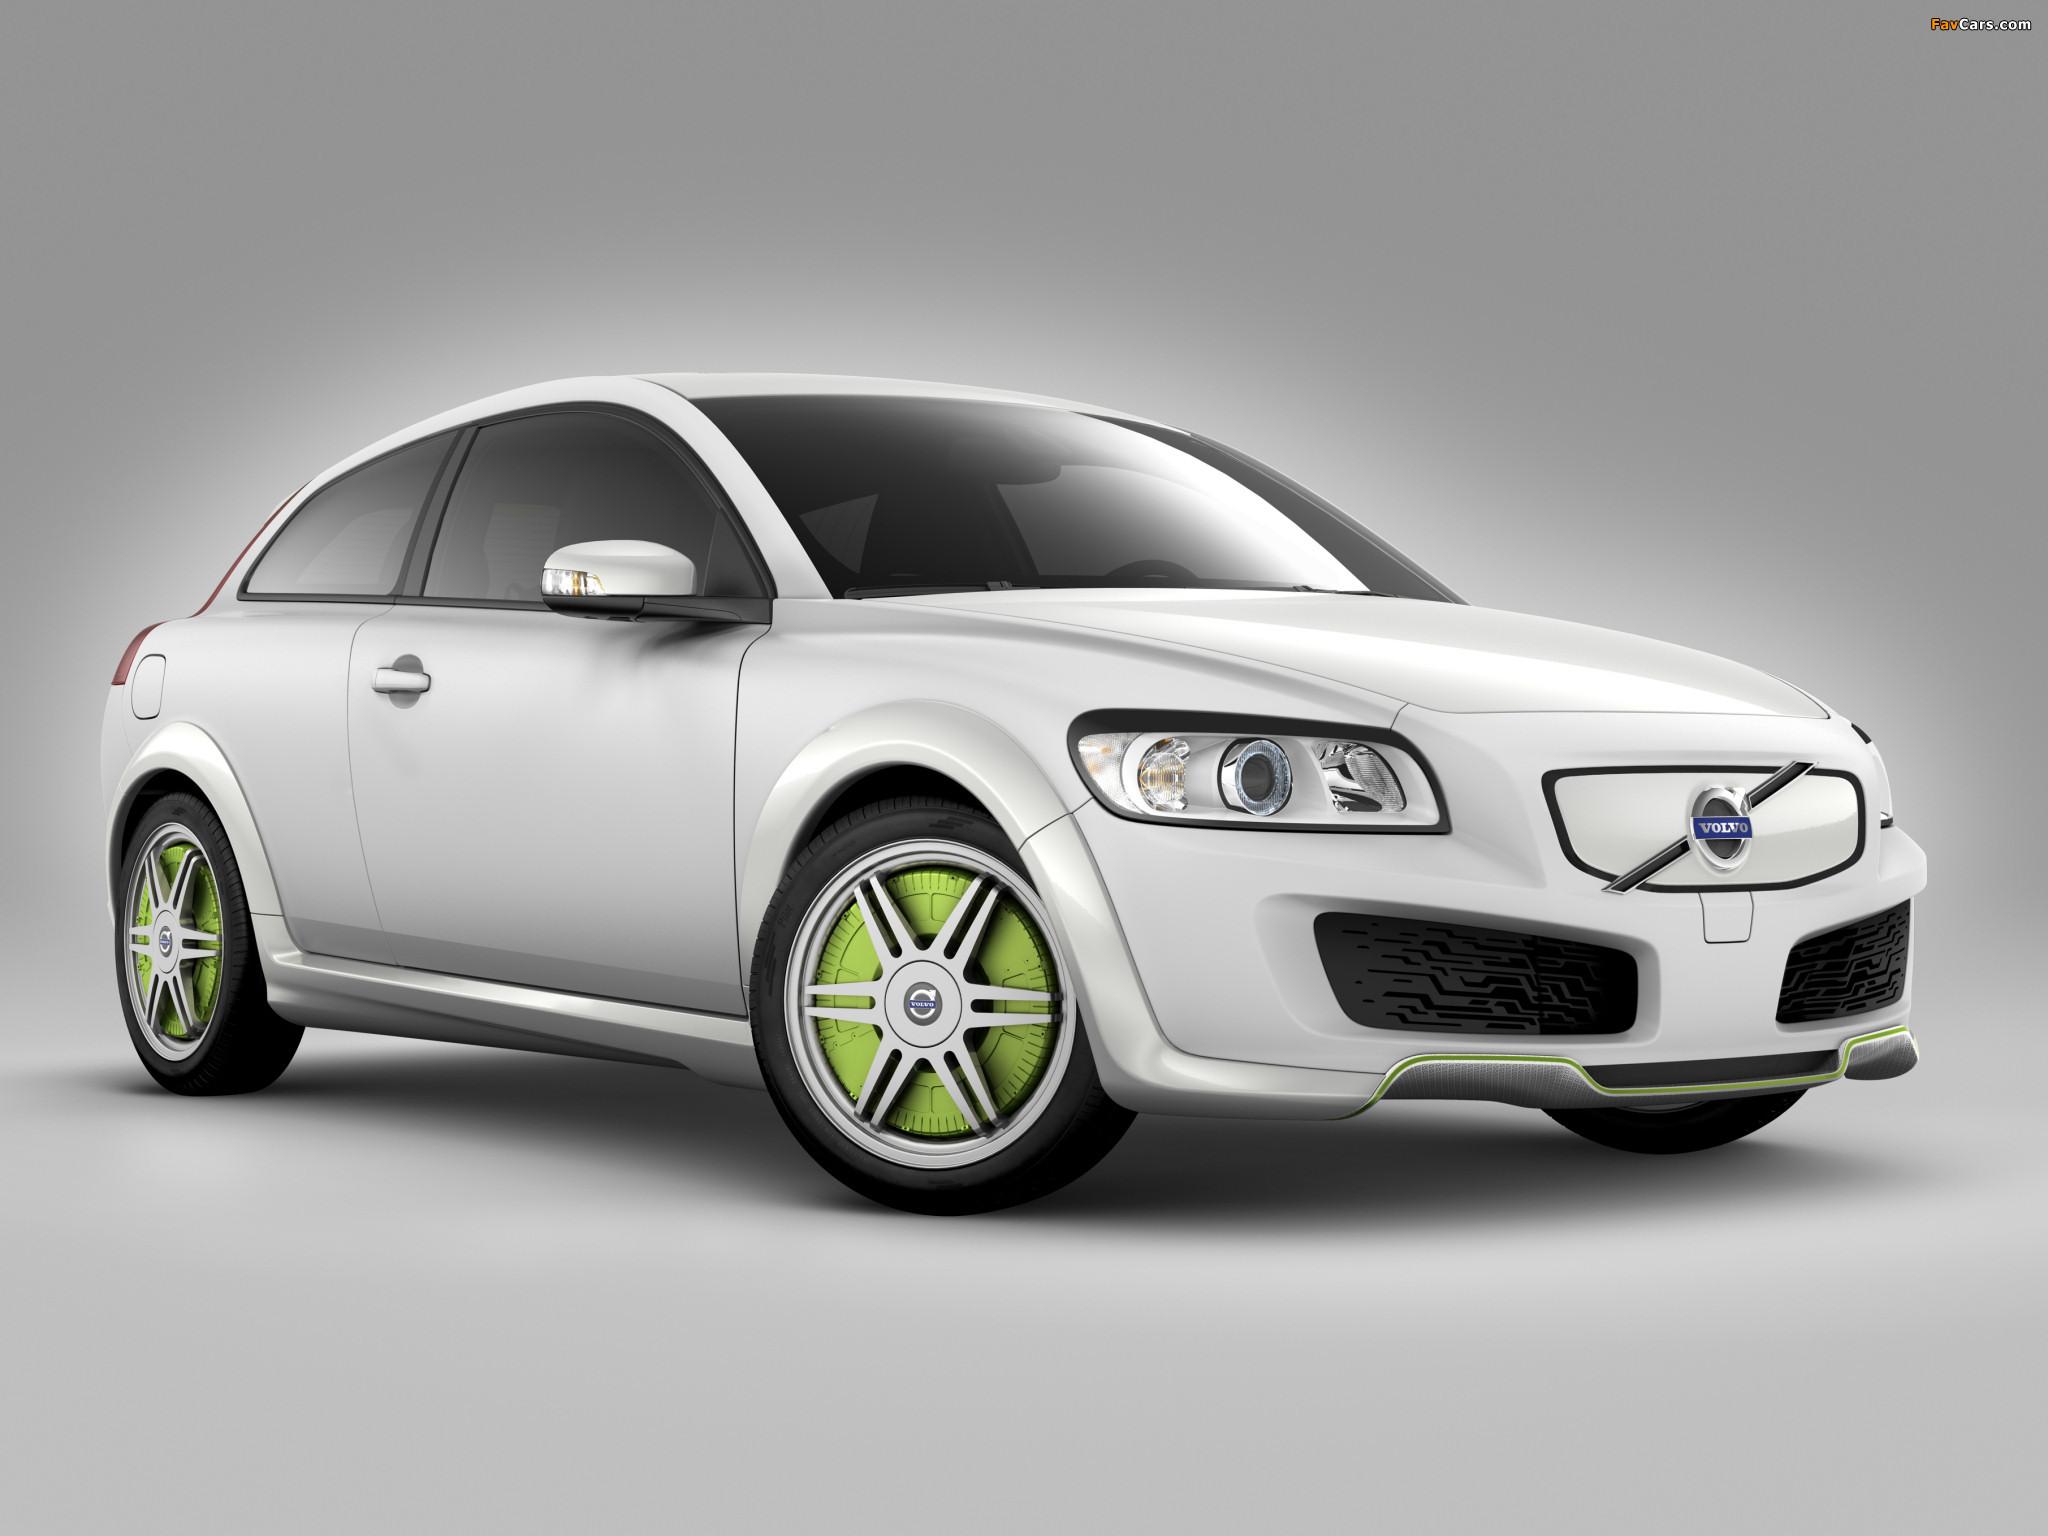 Volvo C30 ReCharge Concept 2007 images (2048 x 1536)